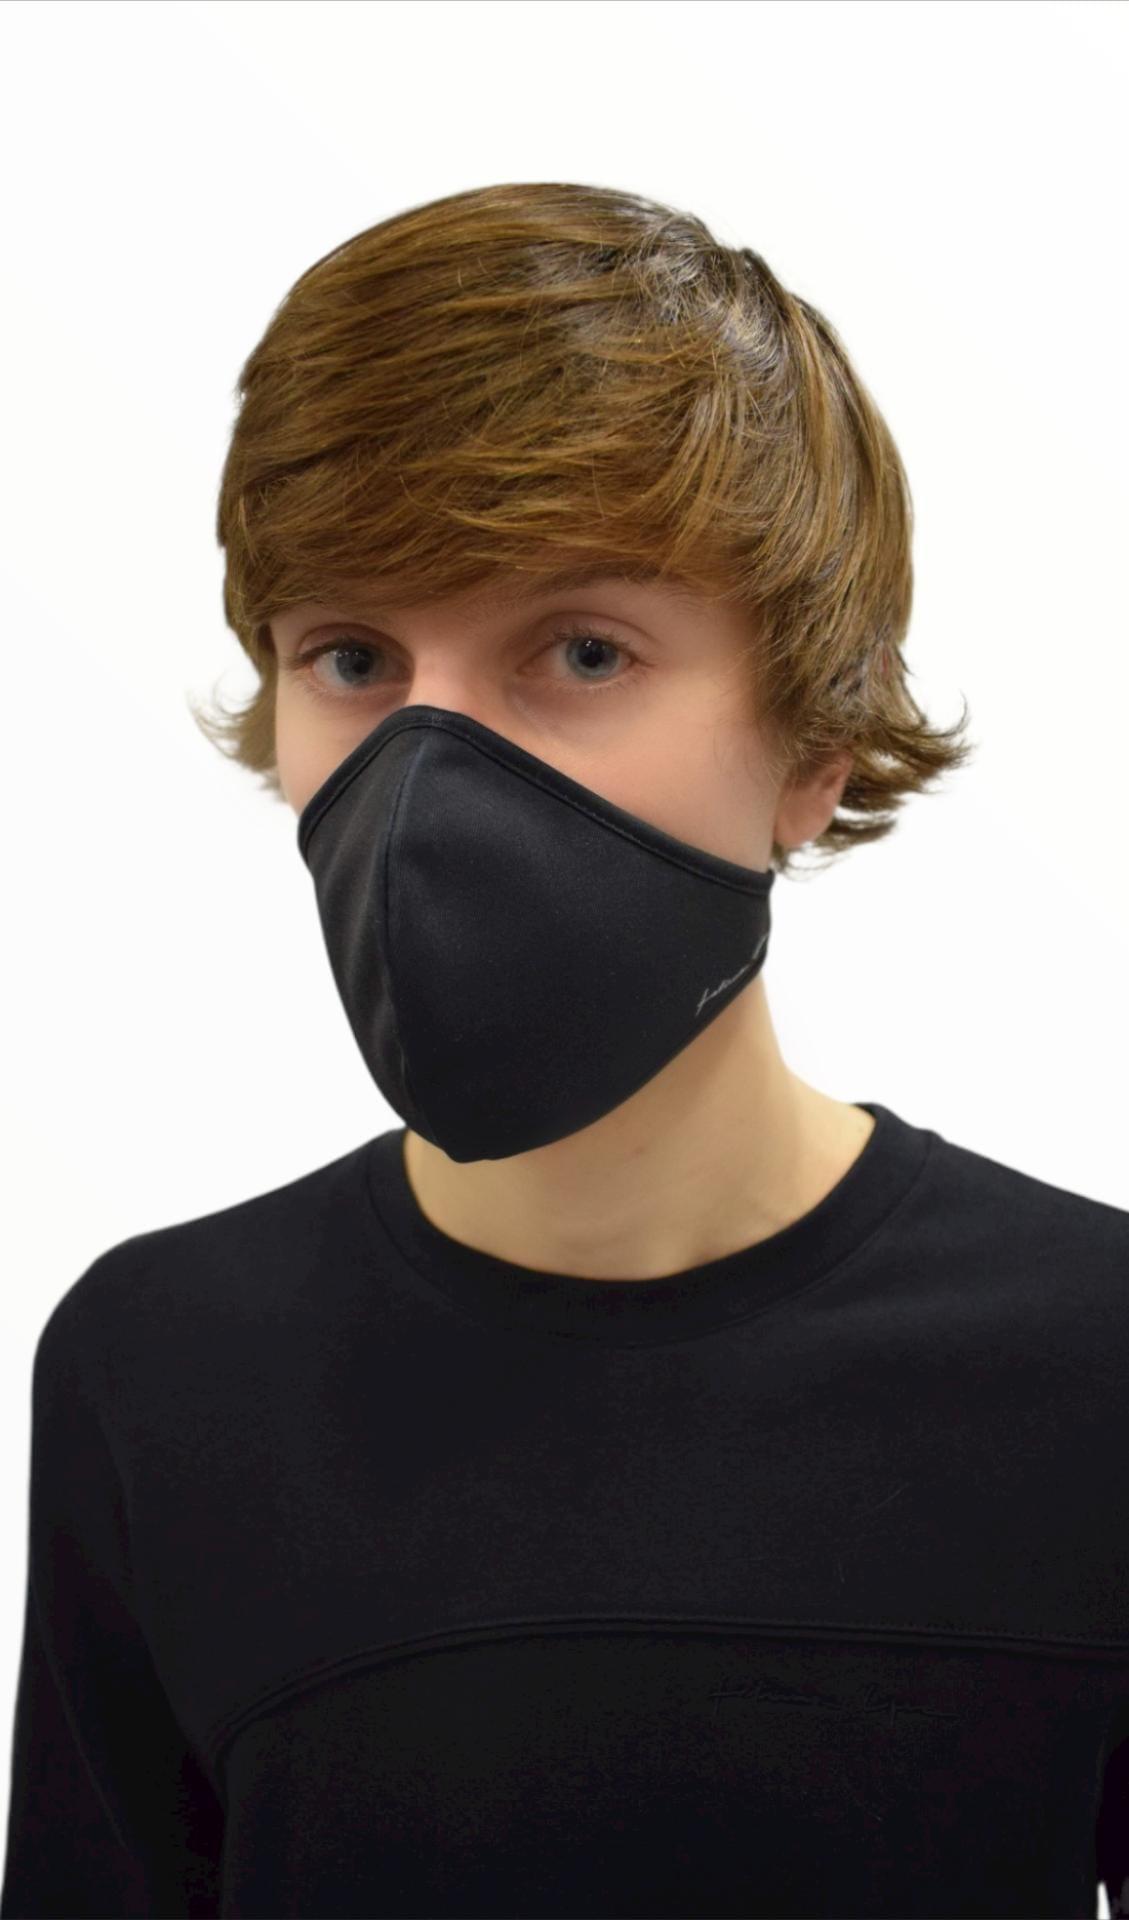 Mask FL BLKM 0